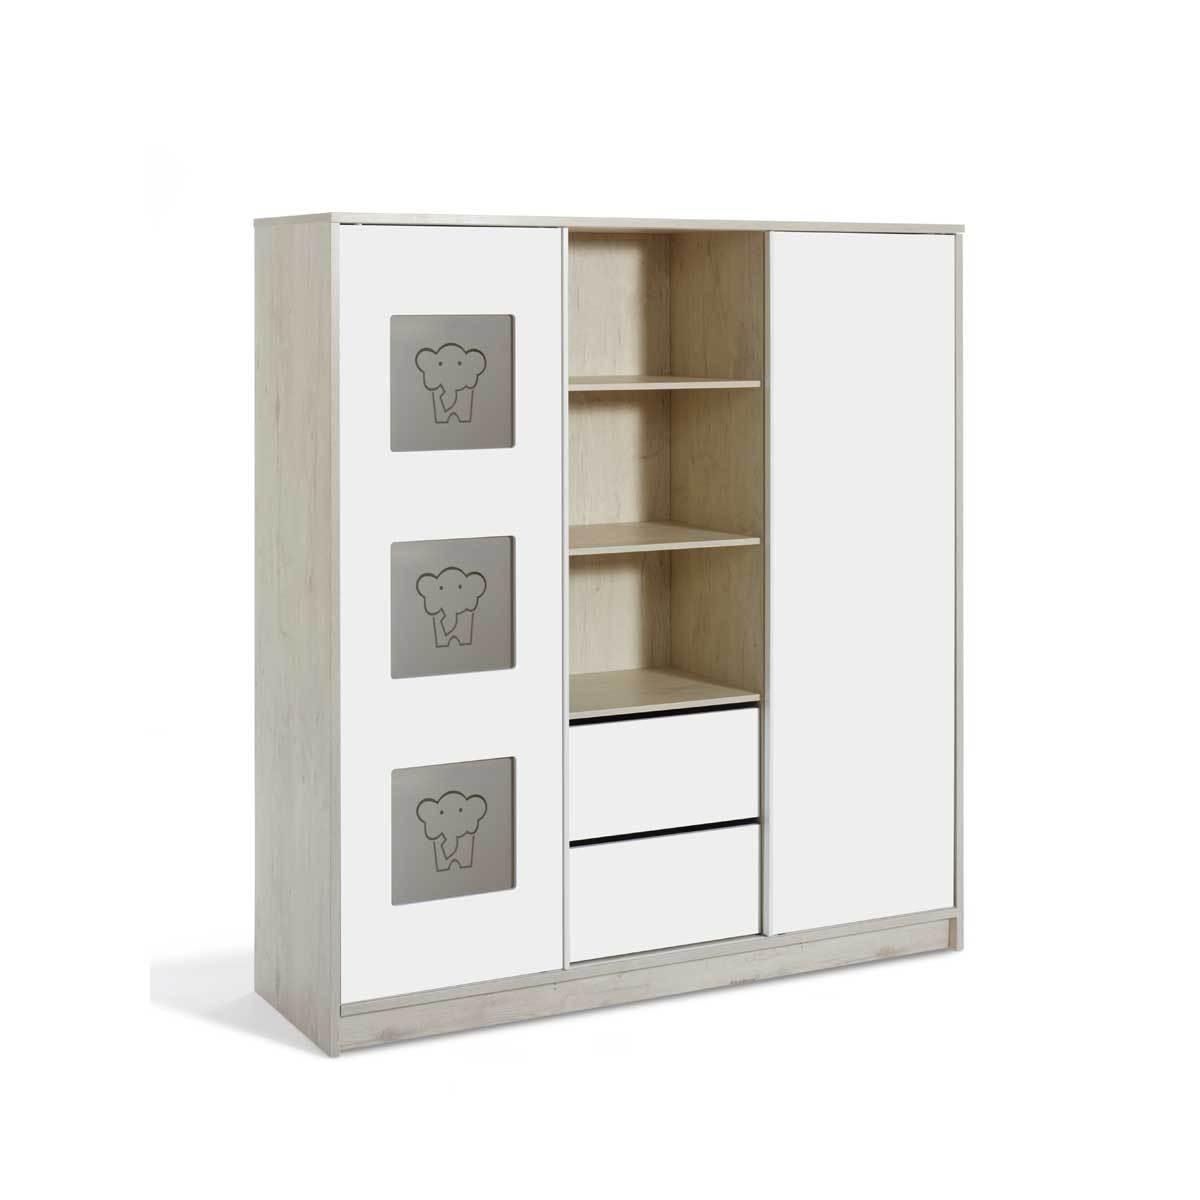 Armoire armoire bb portes eco slide armoire bb portes eco for Armoire grise pas cher